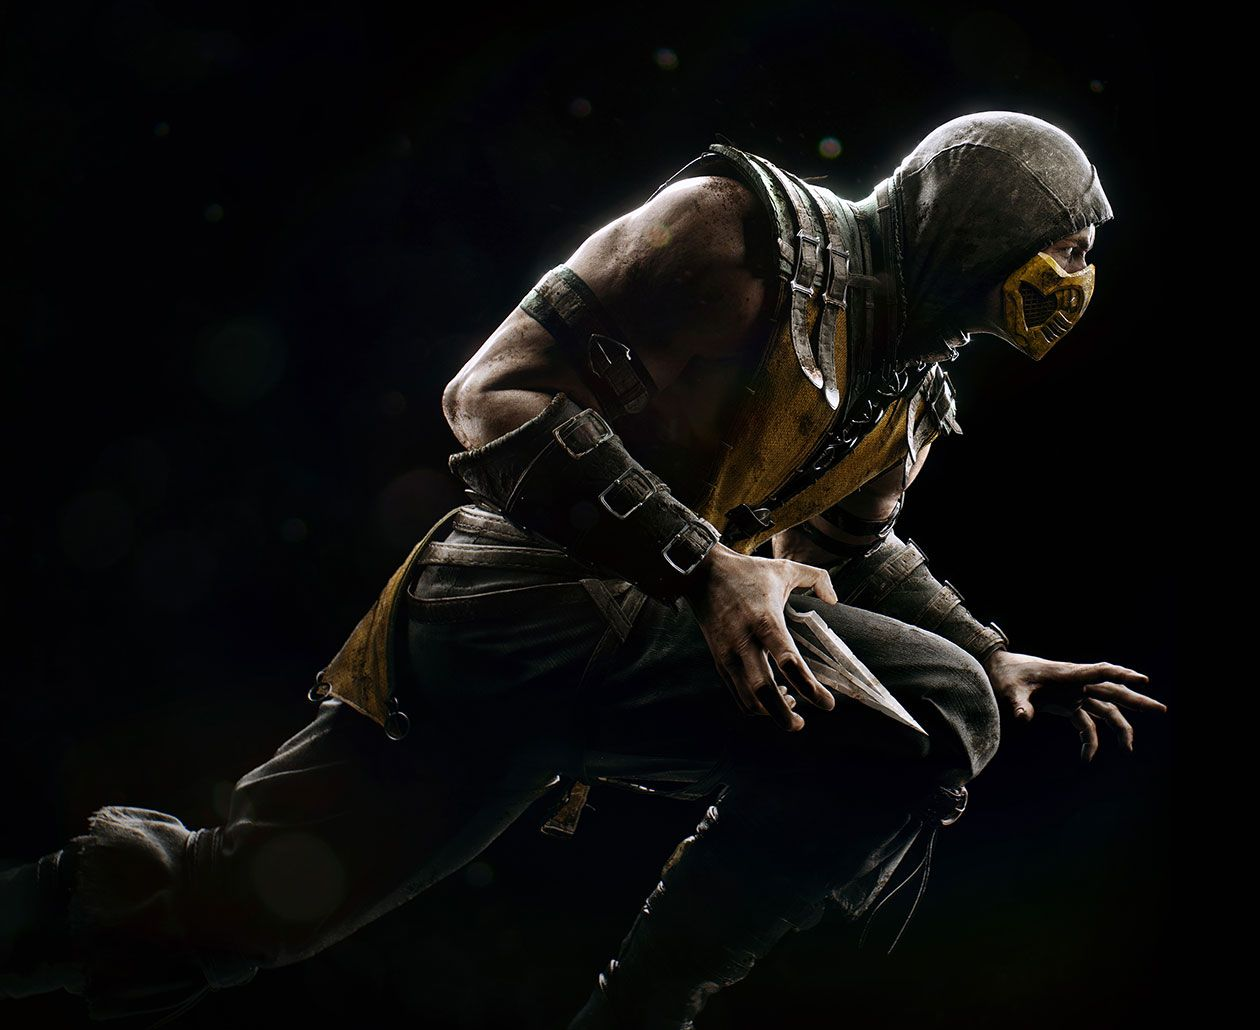 Scorpion Box Art Mortal kombat x scorpion, Mortal kombat